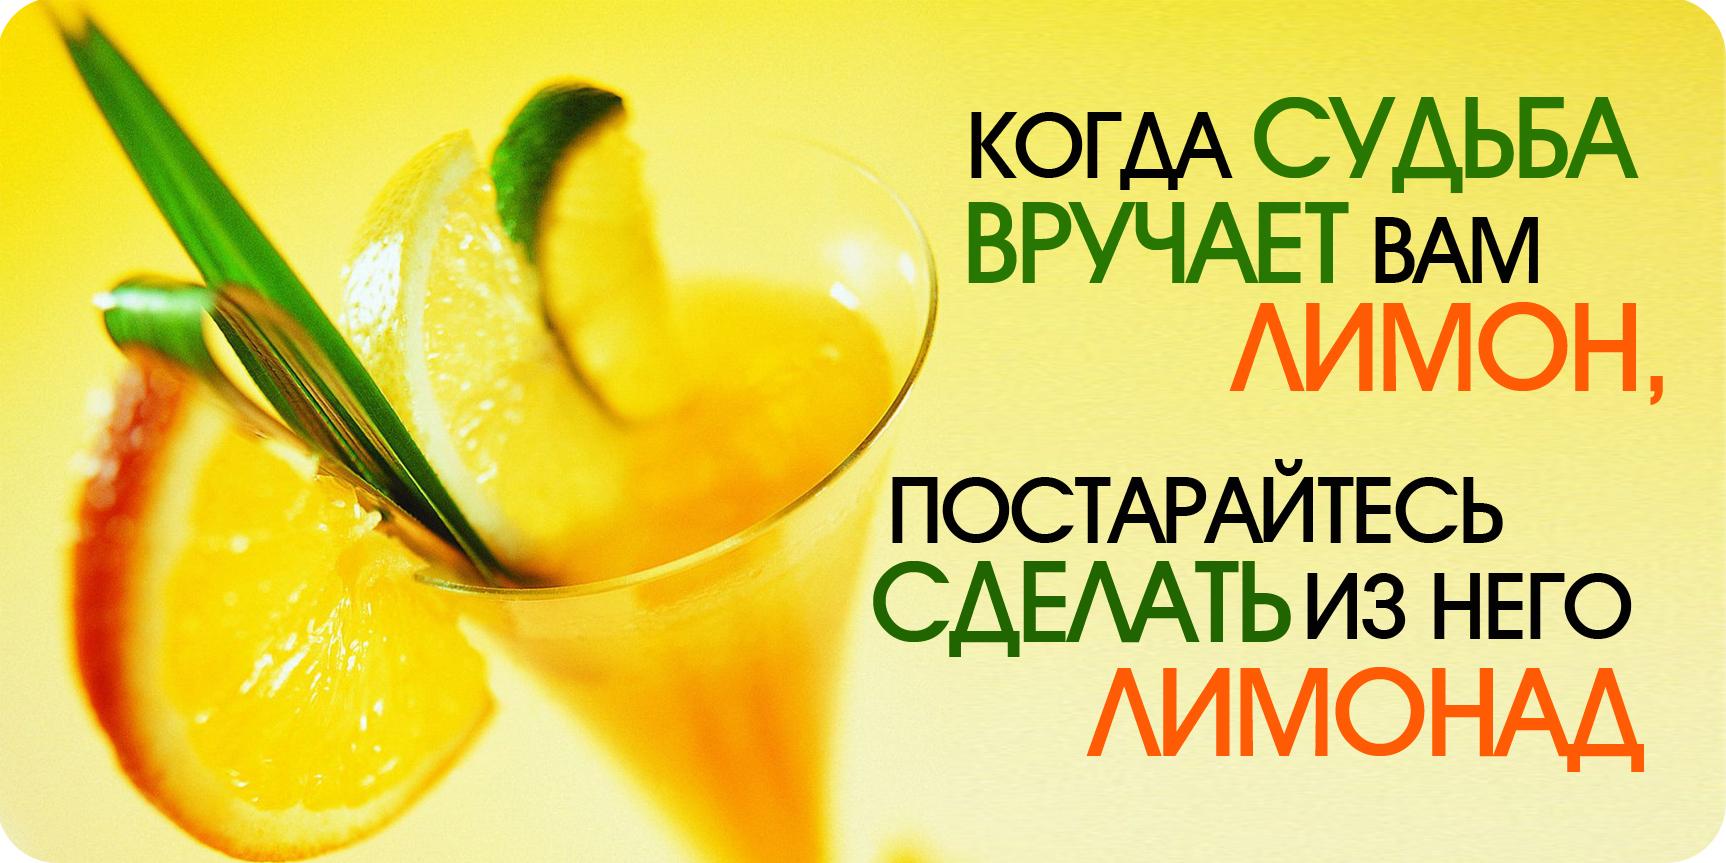 svoim-xodom-13